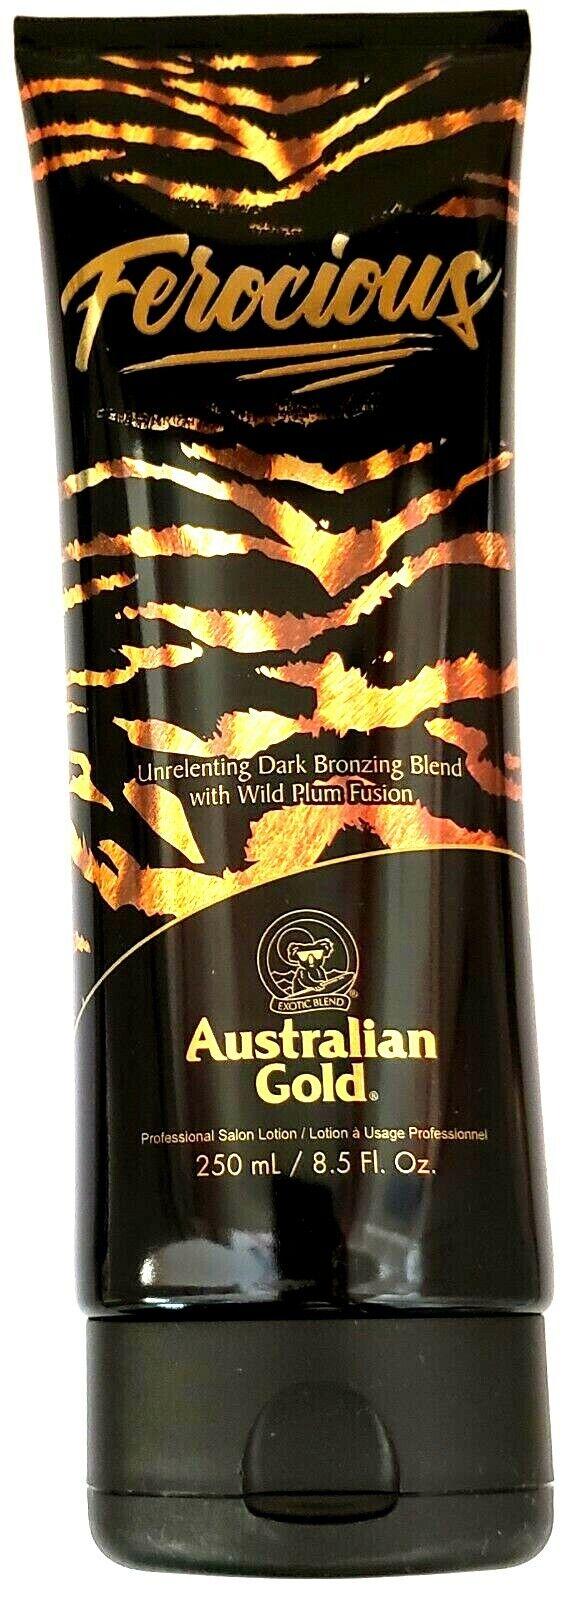 Australian Gold Ferocious Dark Bronzing Tanning Lotion Blend W/ Wild Plum Fusion - $24.90